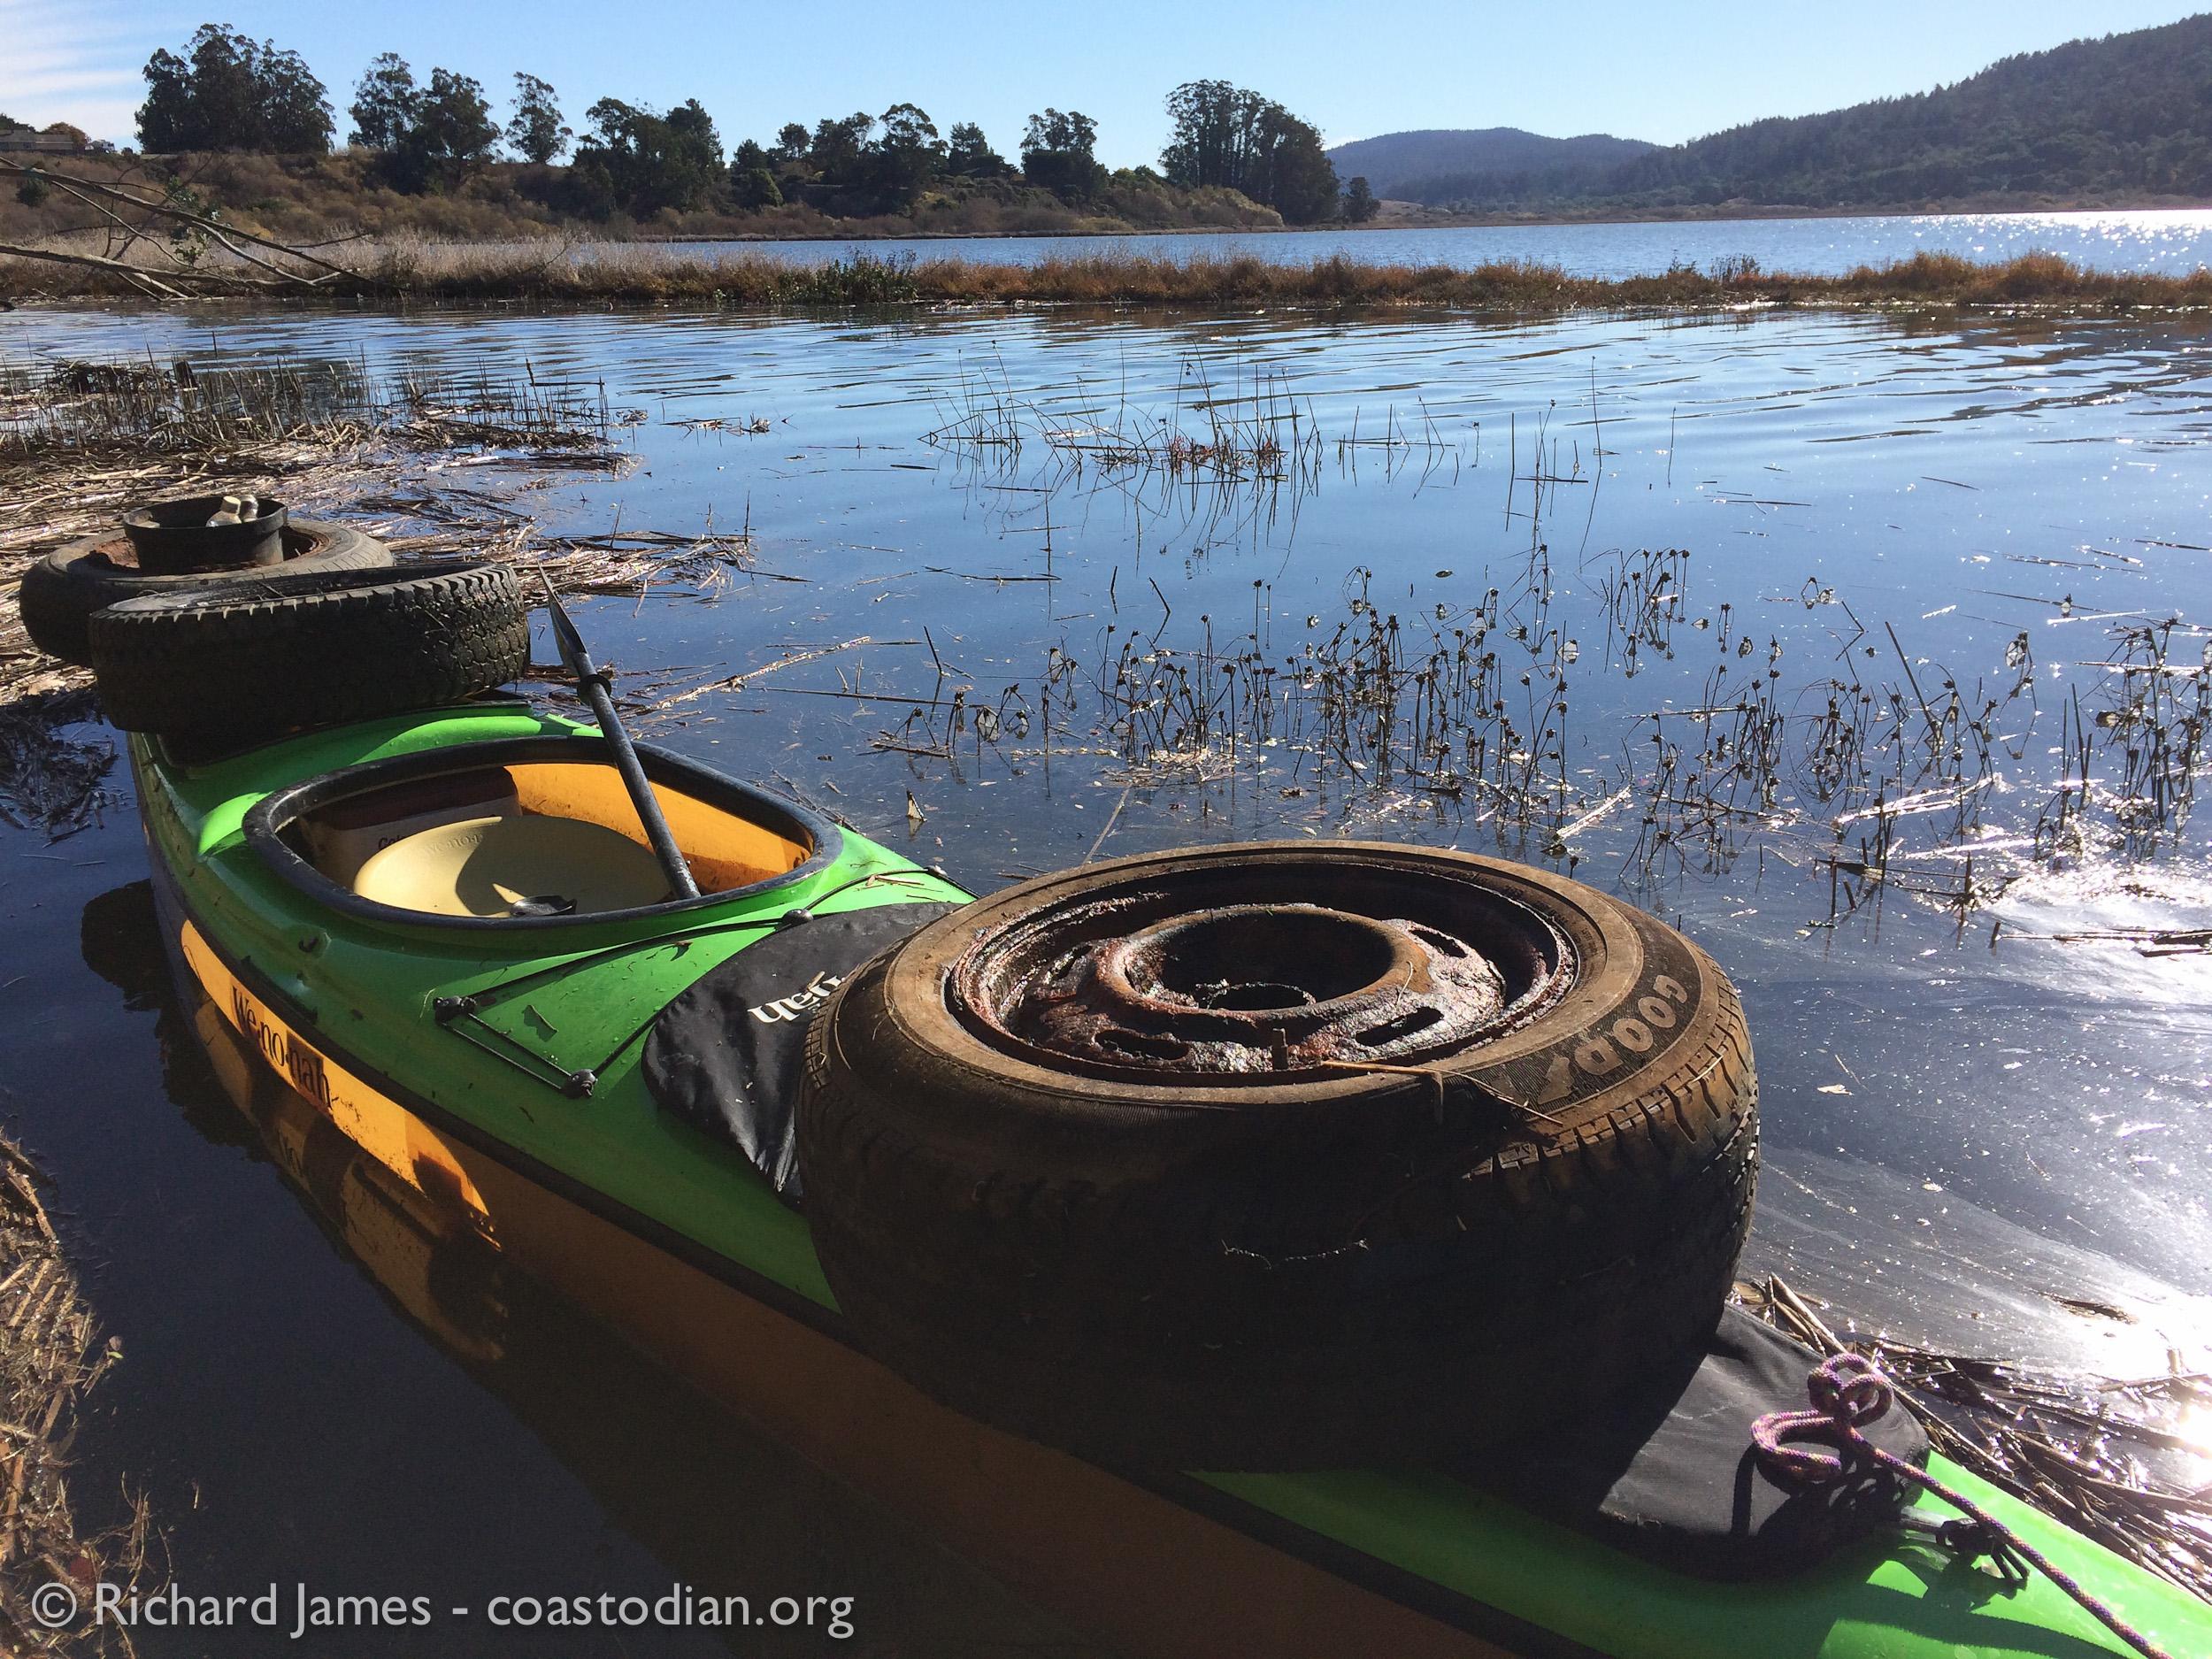 Three tires is a full load it seems.  ©Richard James - coastodian.org